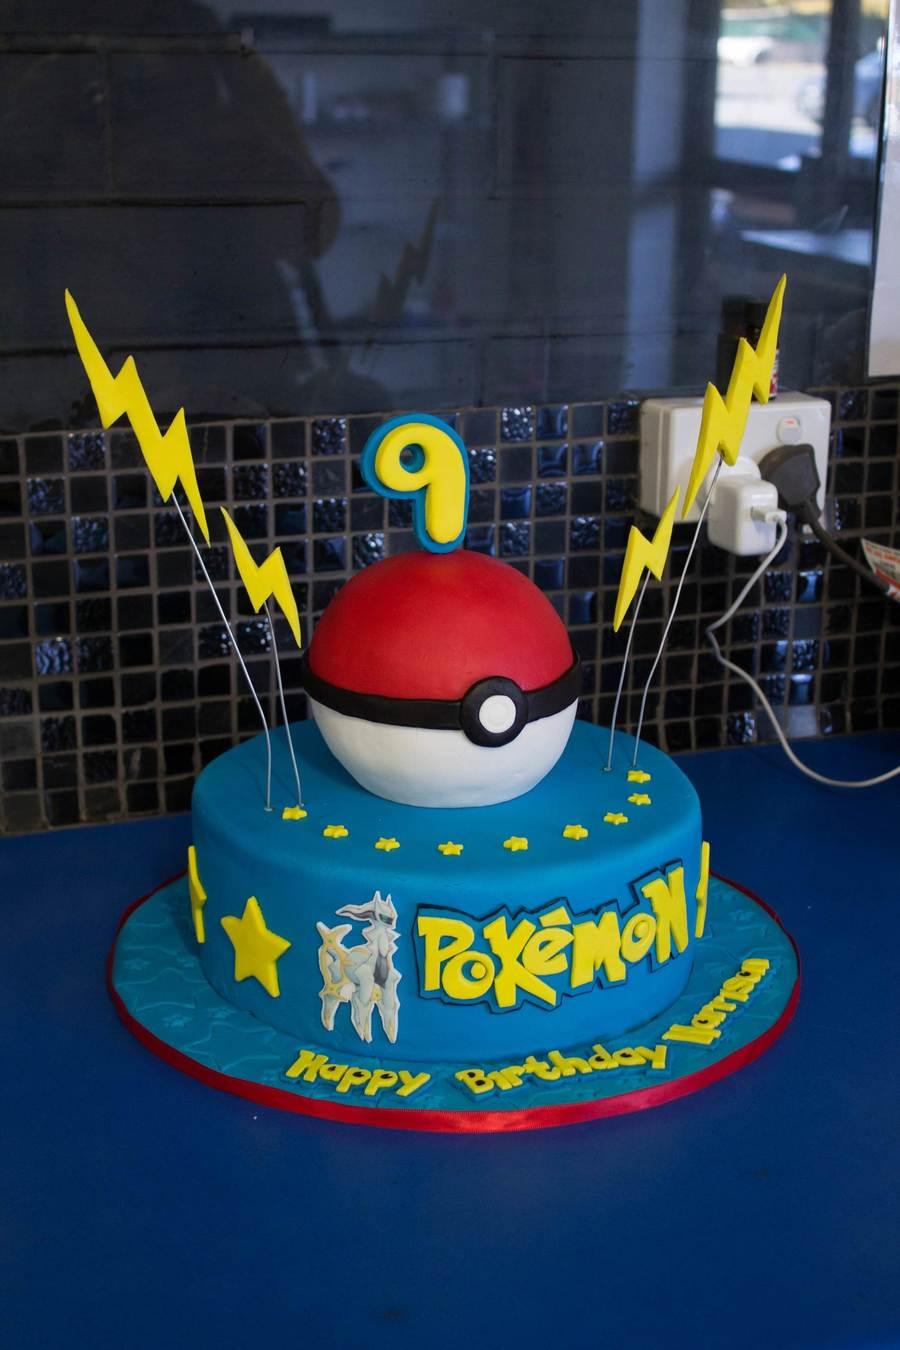 Where Can I Order A Pokemon Birthday Cake